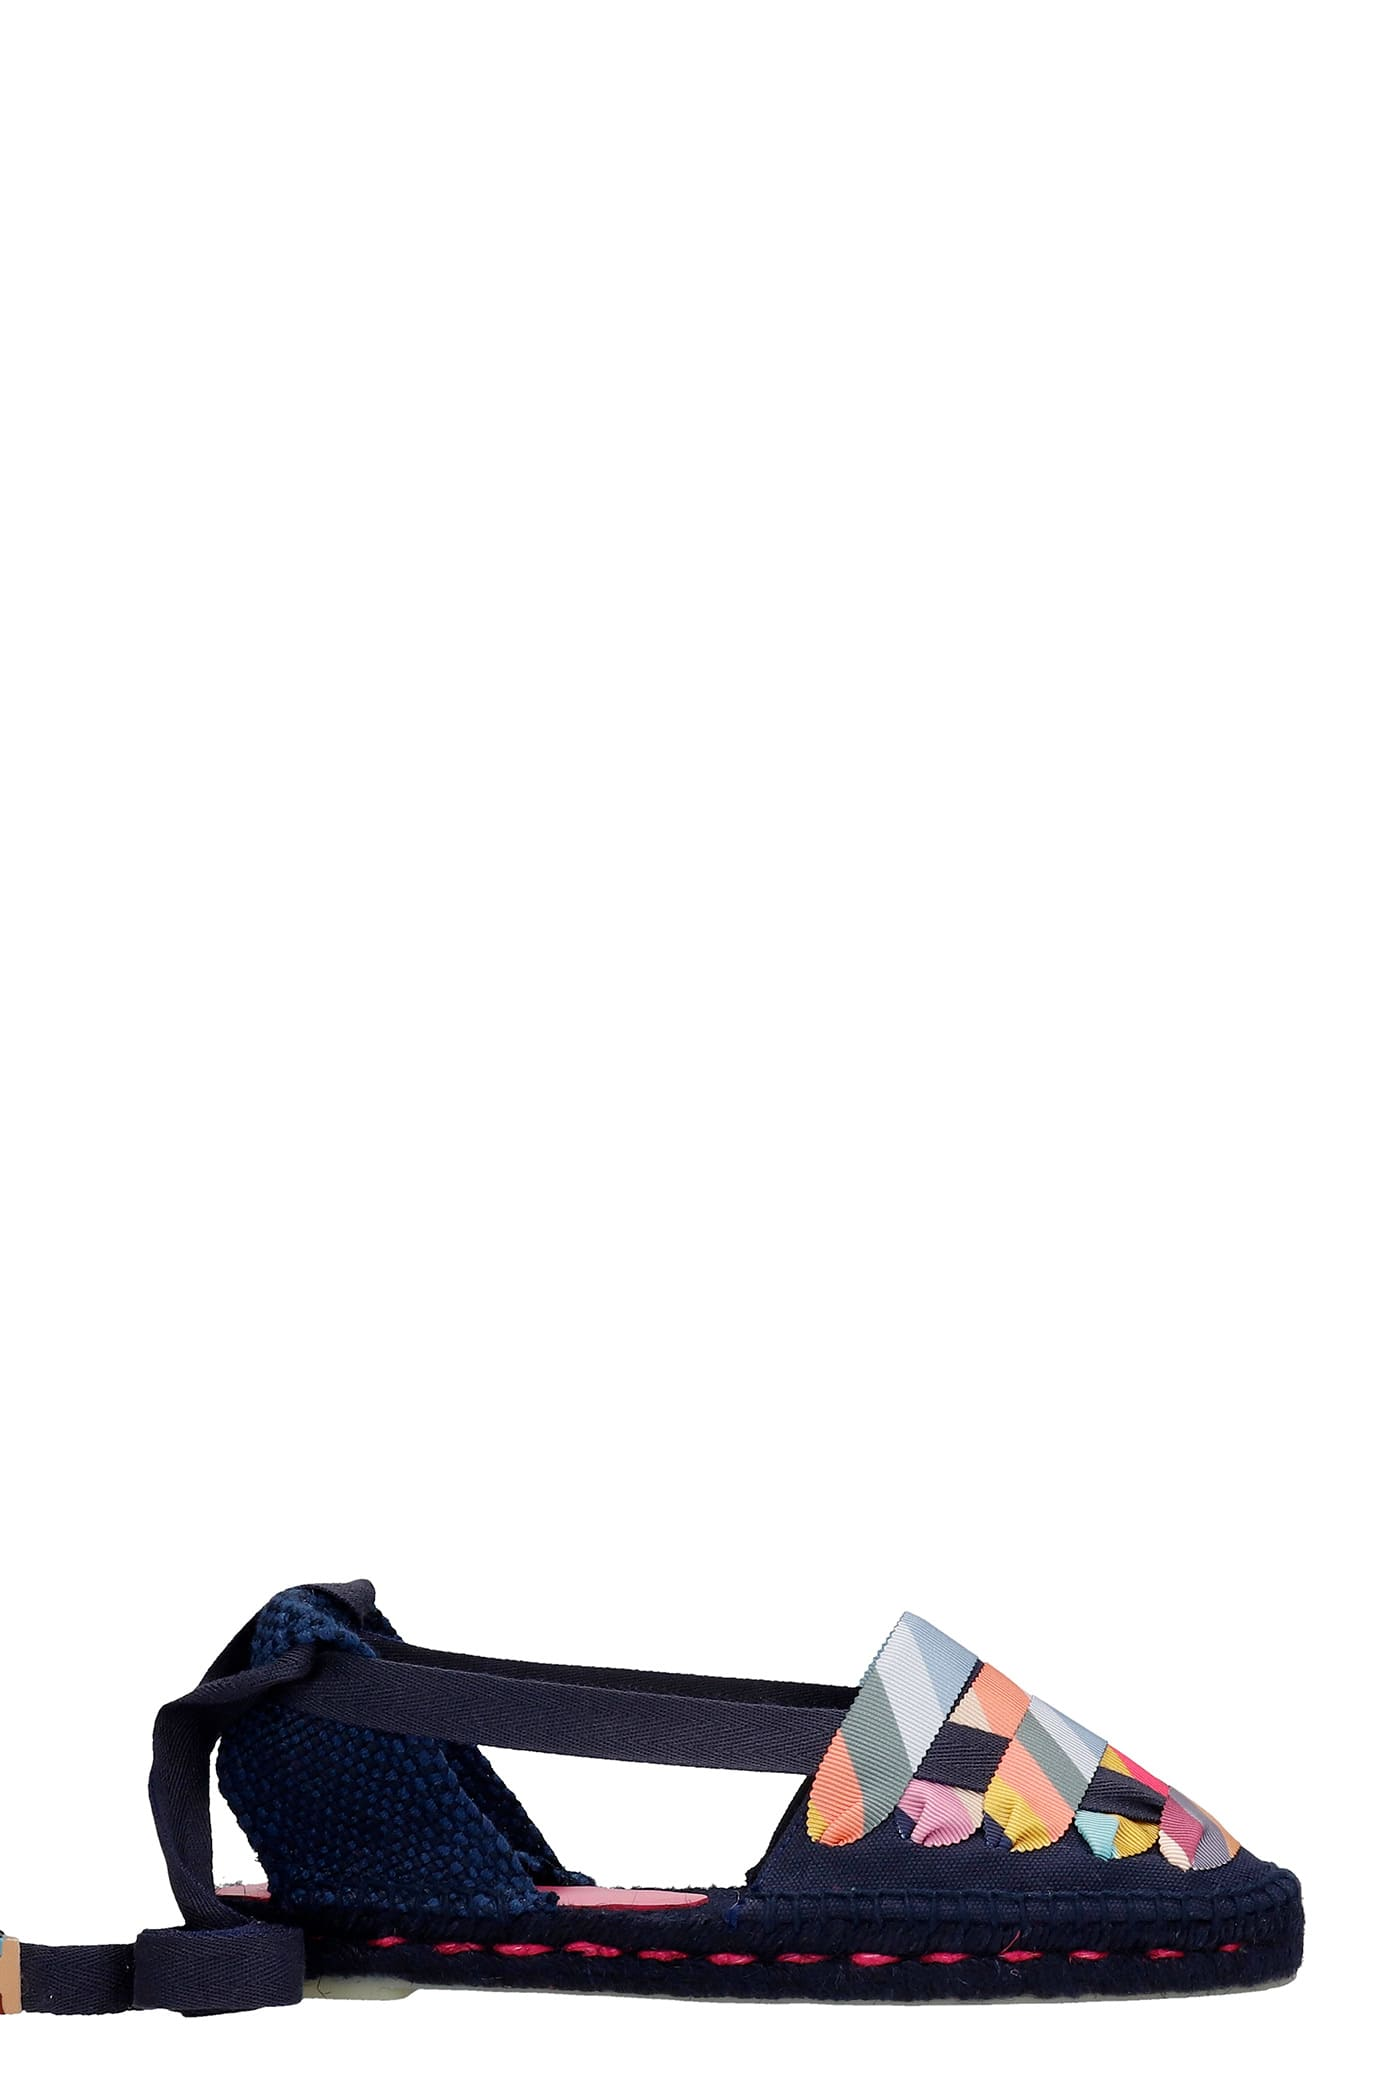 Jean C Ps 001 Espadrilles In Blue Canvas